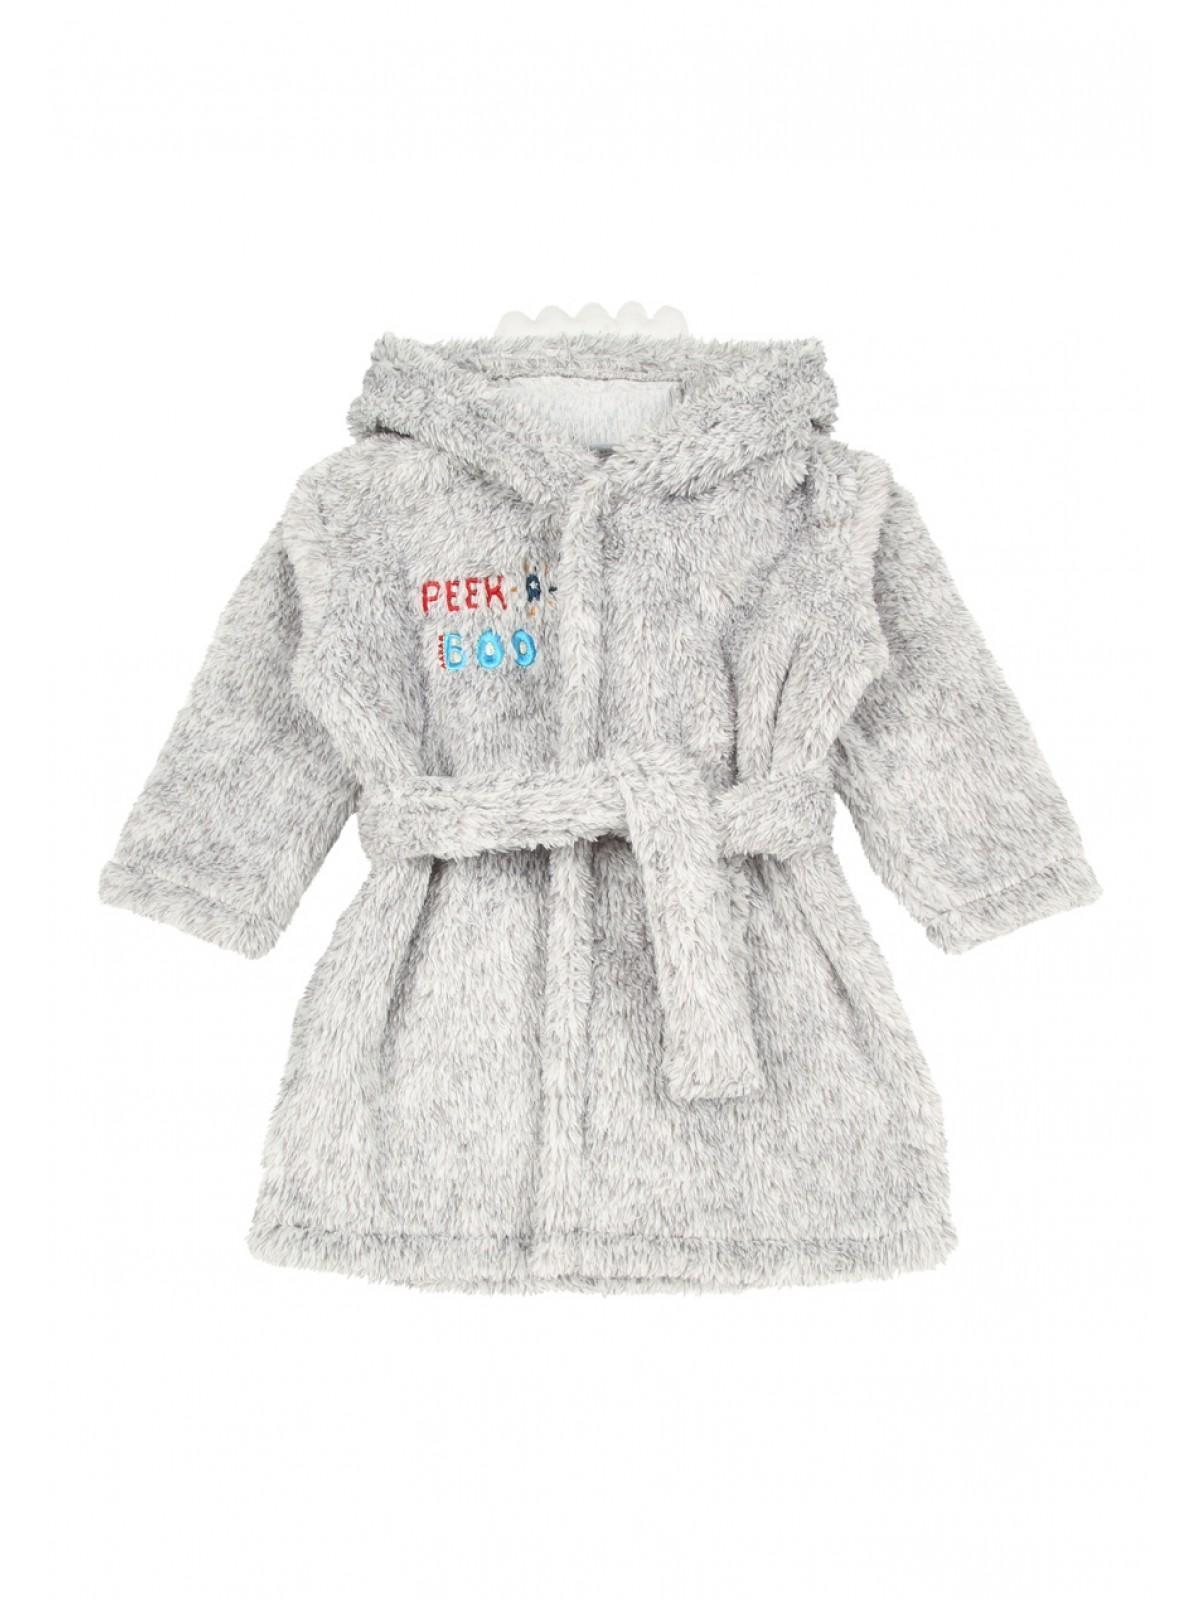 Baby Boys Grey Monster Dressing Gown and Slipper Set | Peacocks